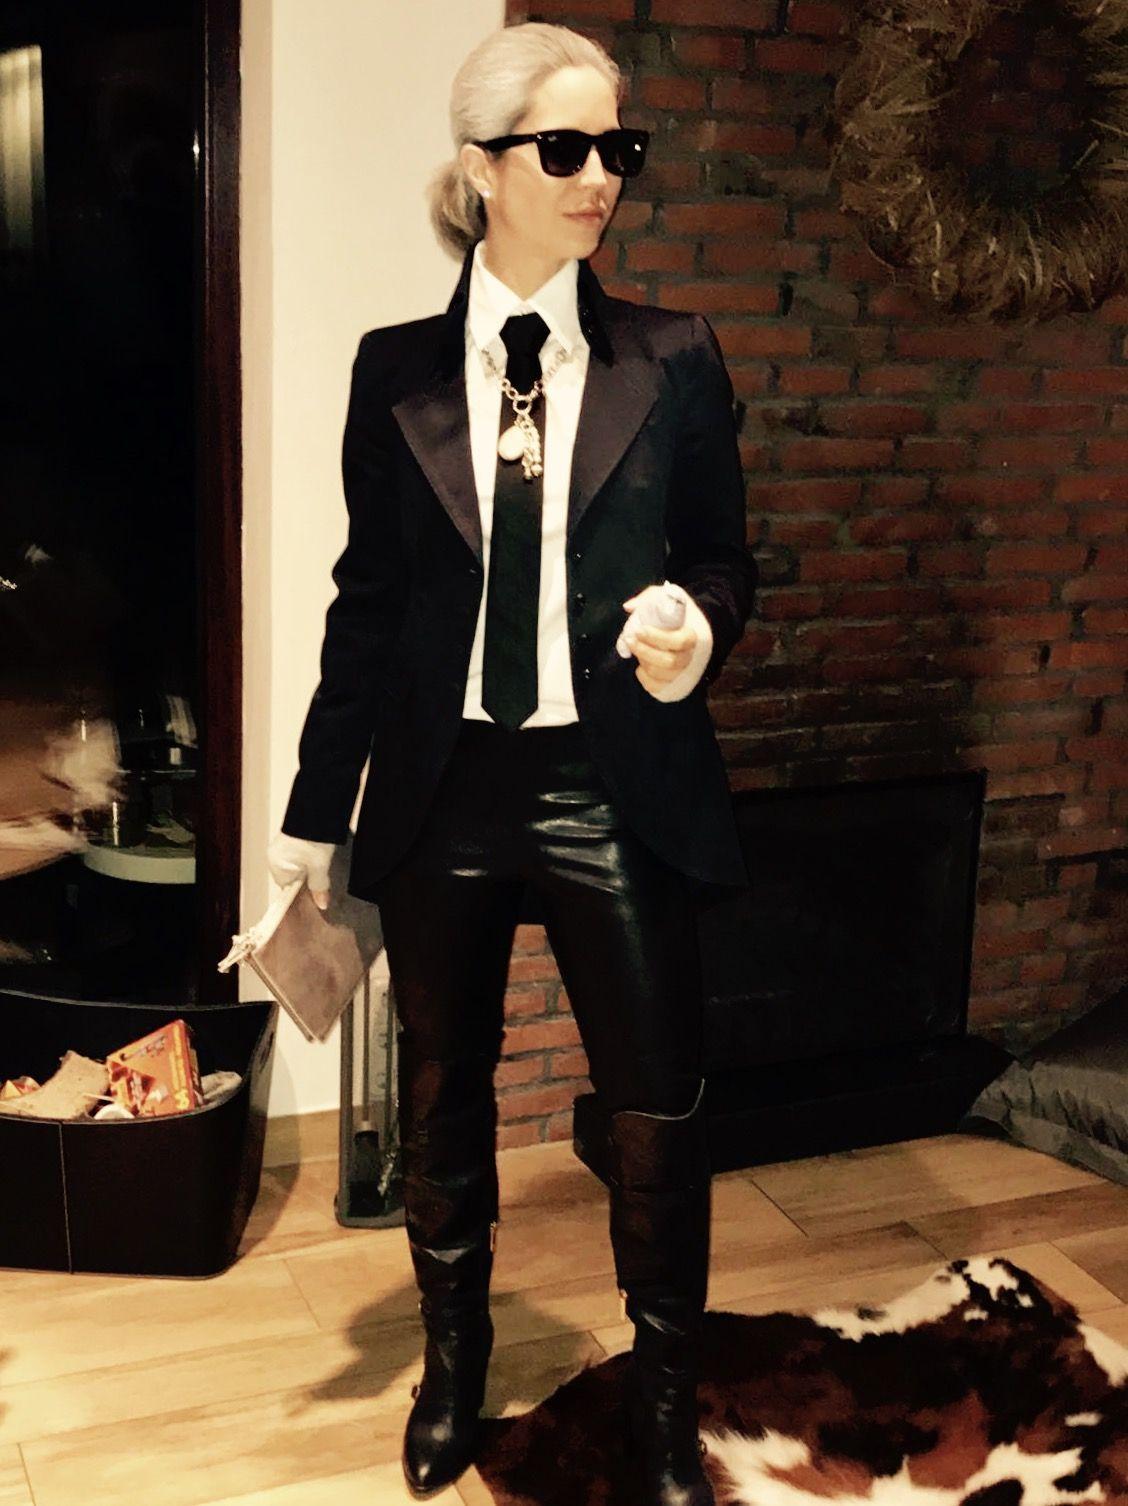 Karl Lagerfeld Kostüm | Kostüm, Fastnacht kostüme, Kostüme